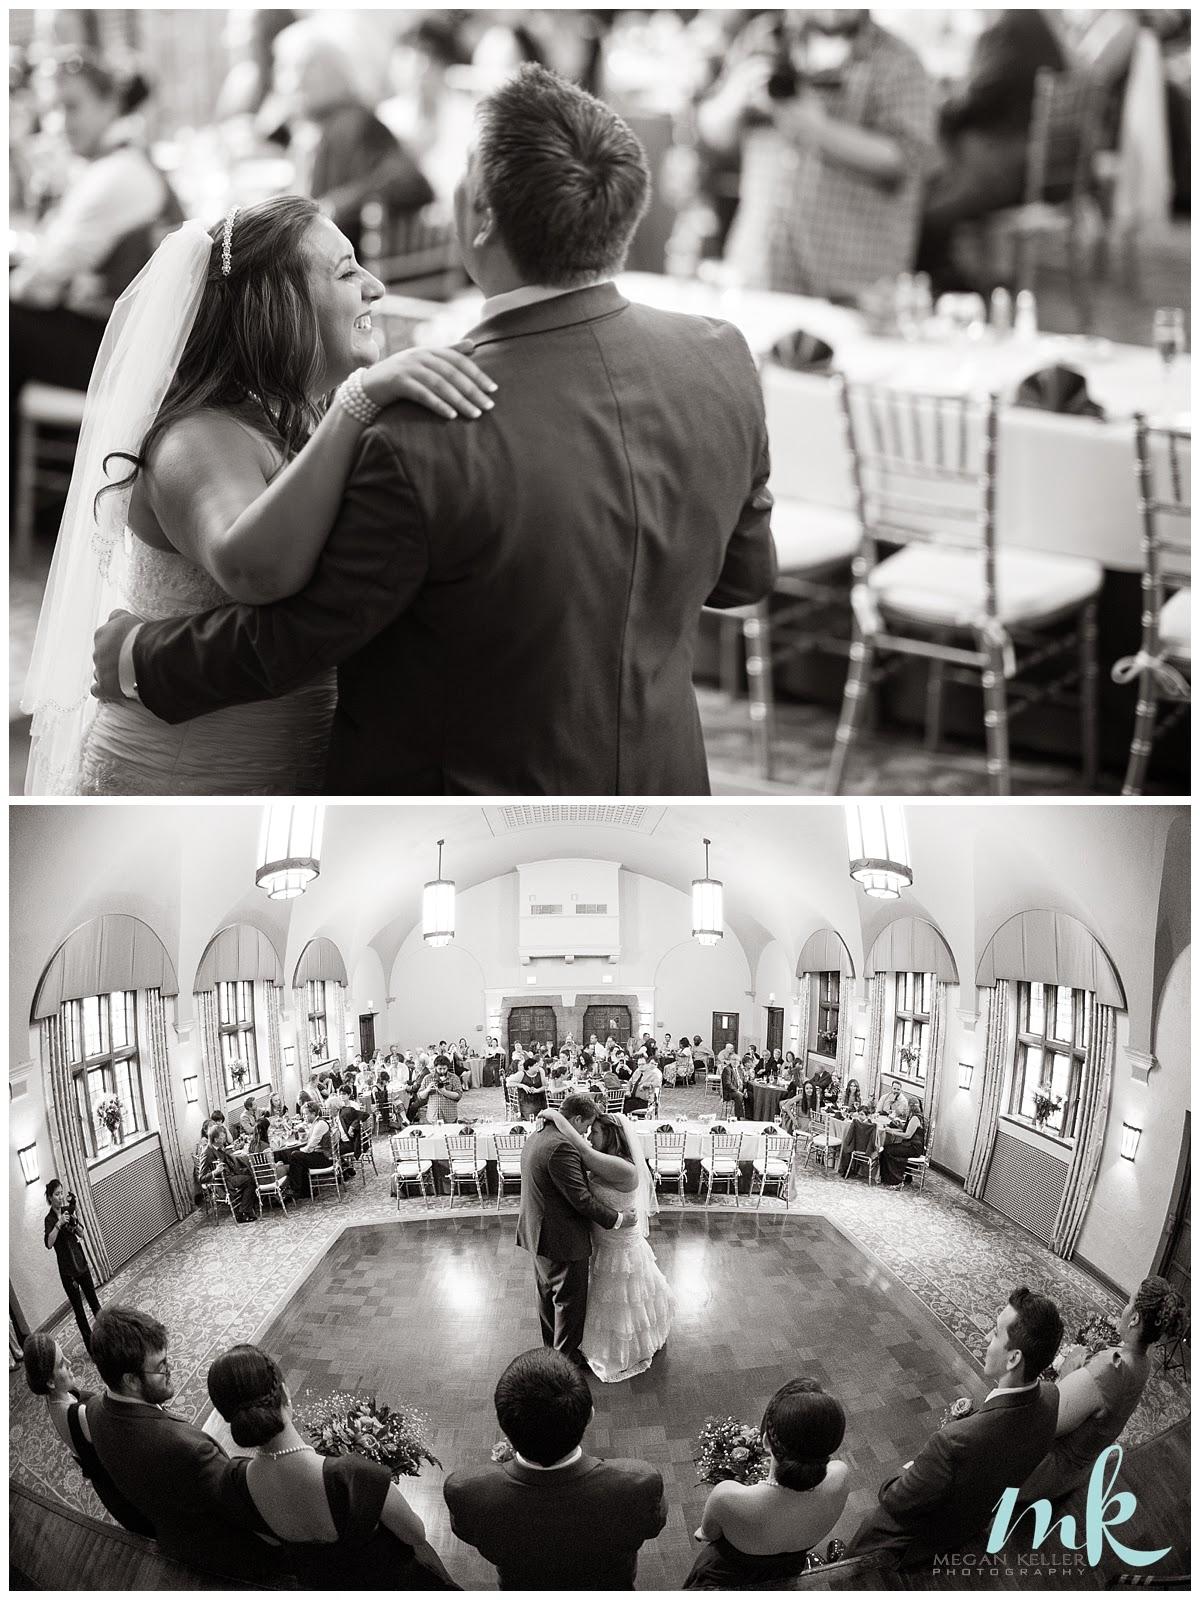 Marissa and Justin's Wedding Marissa and Justin's Wedding 2014 07 30 0013